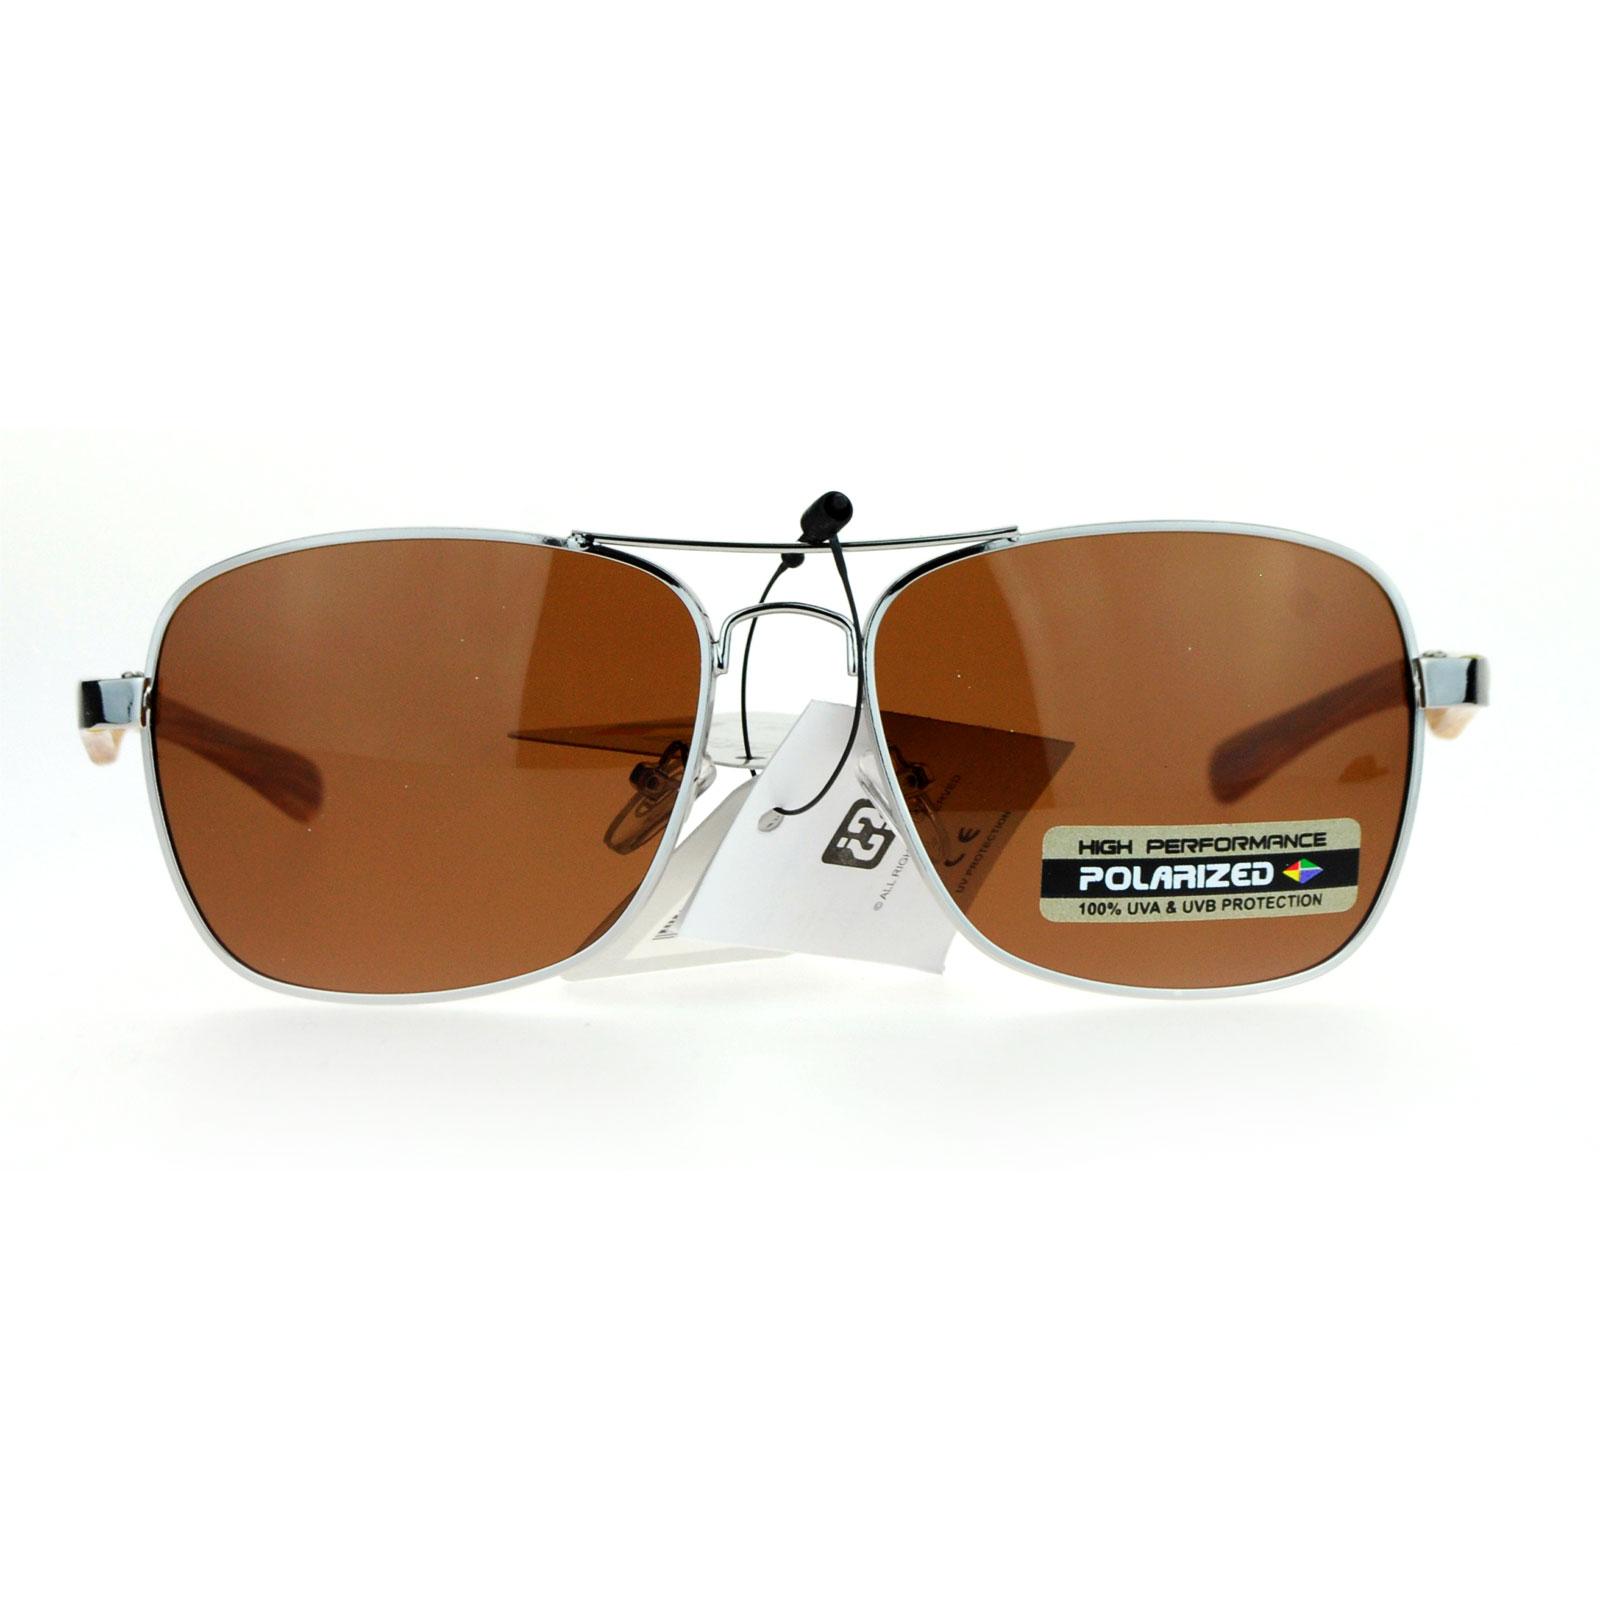 SA106 Antiglare Polarized Lens Mens Rectangular Aviator Sunglasses